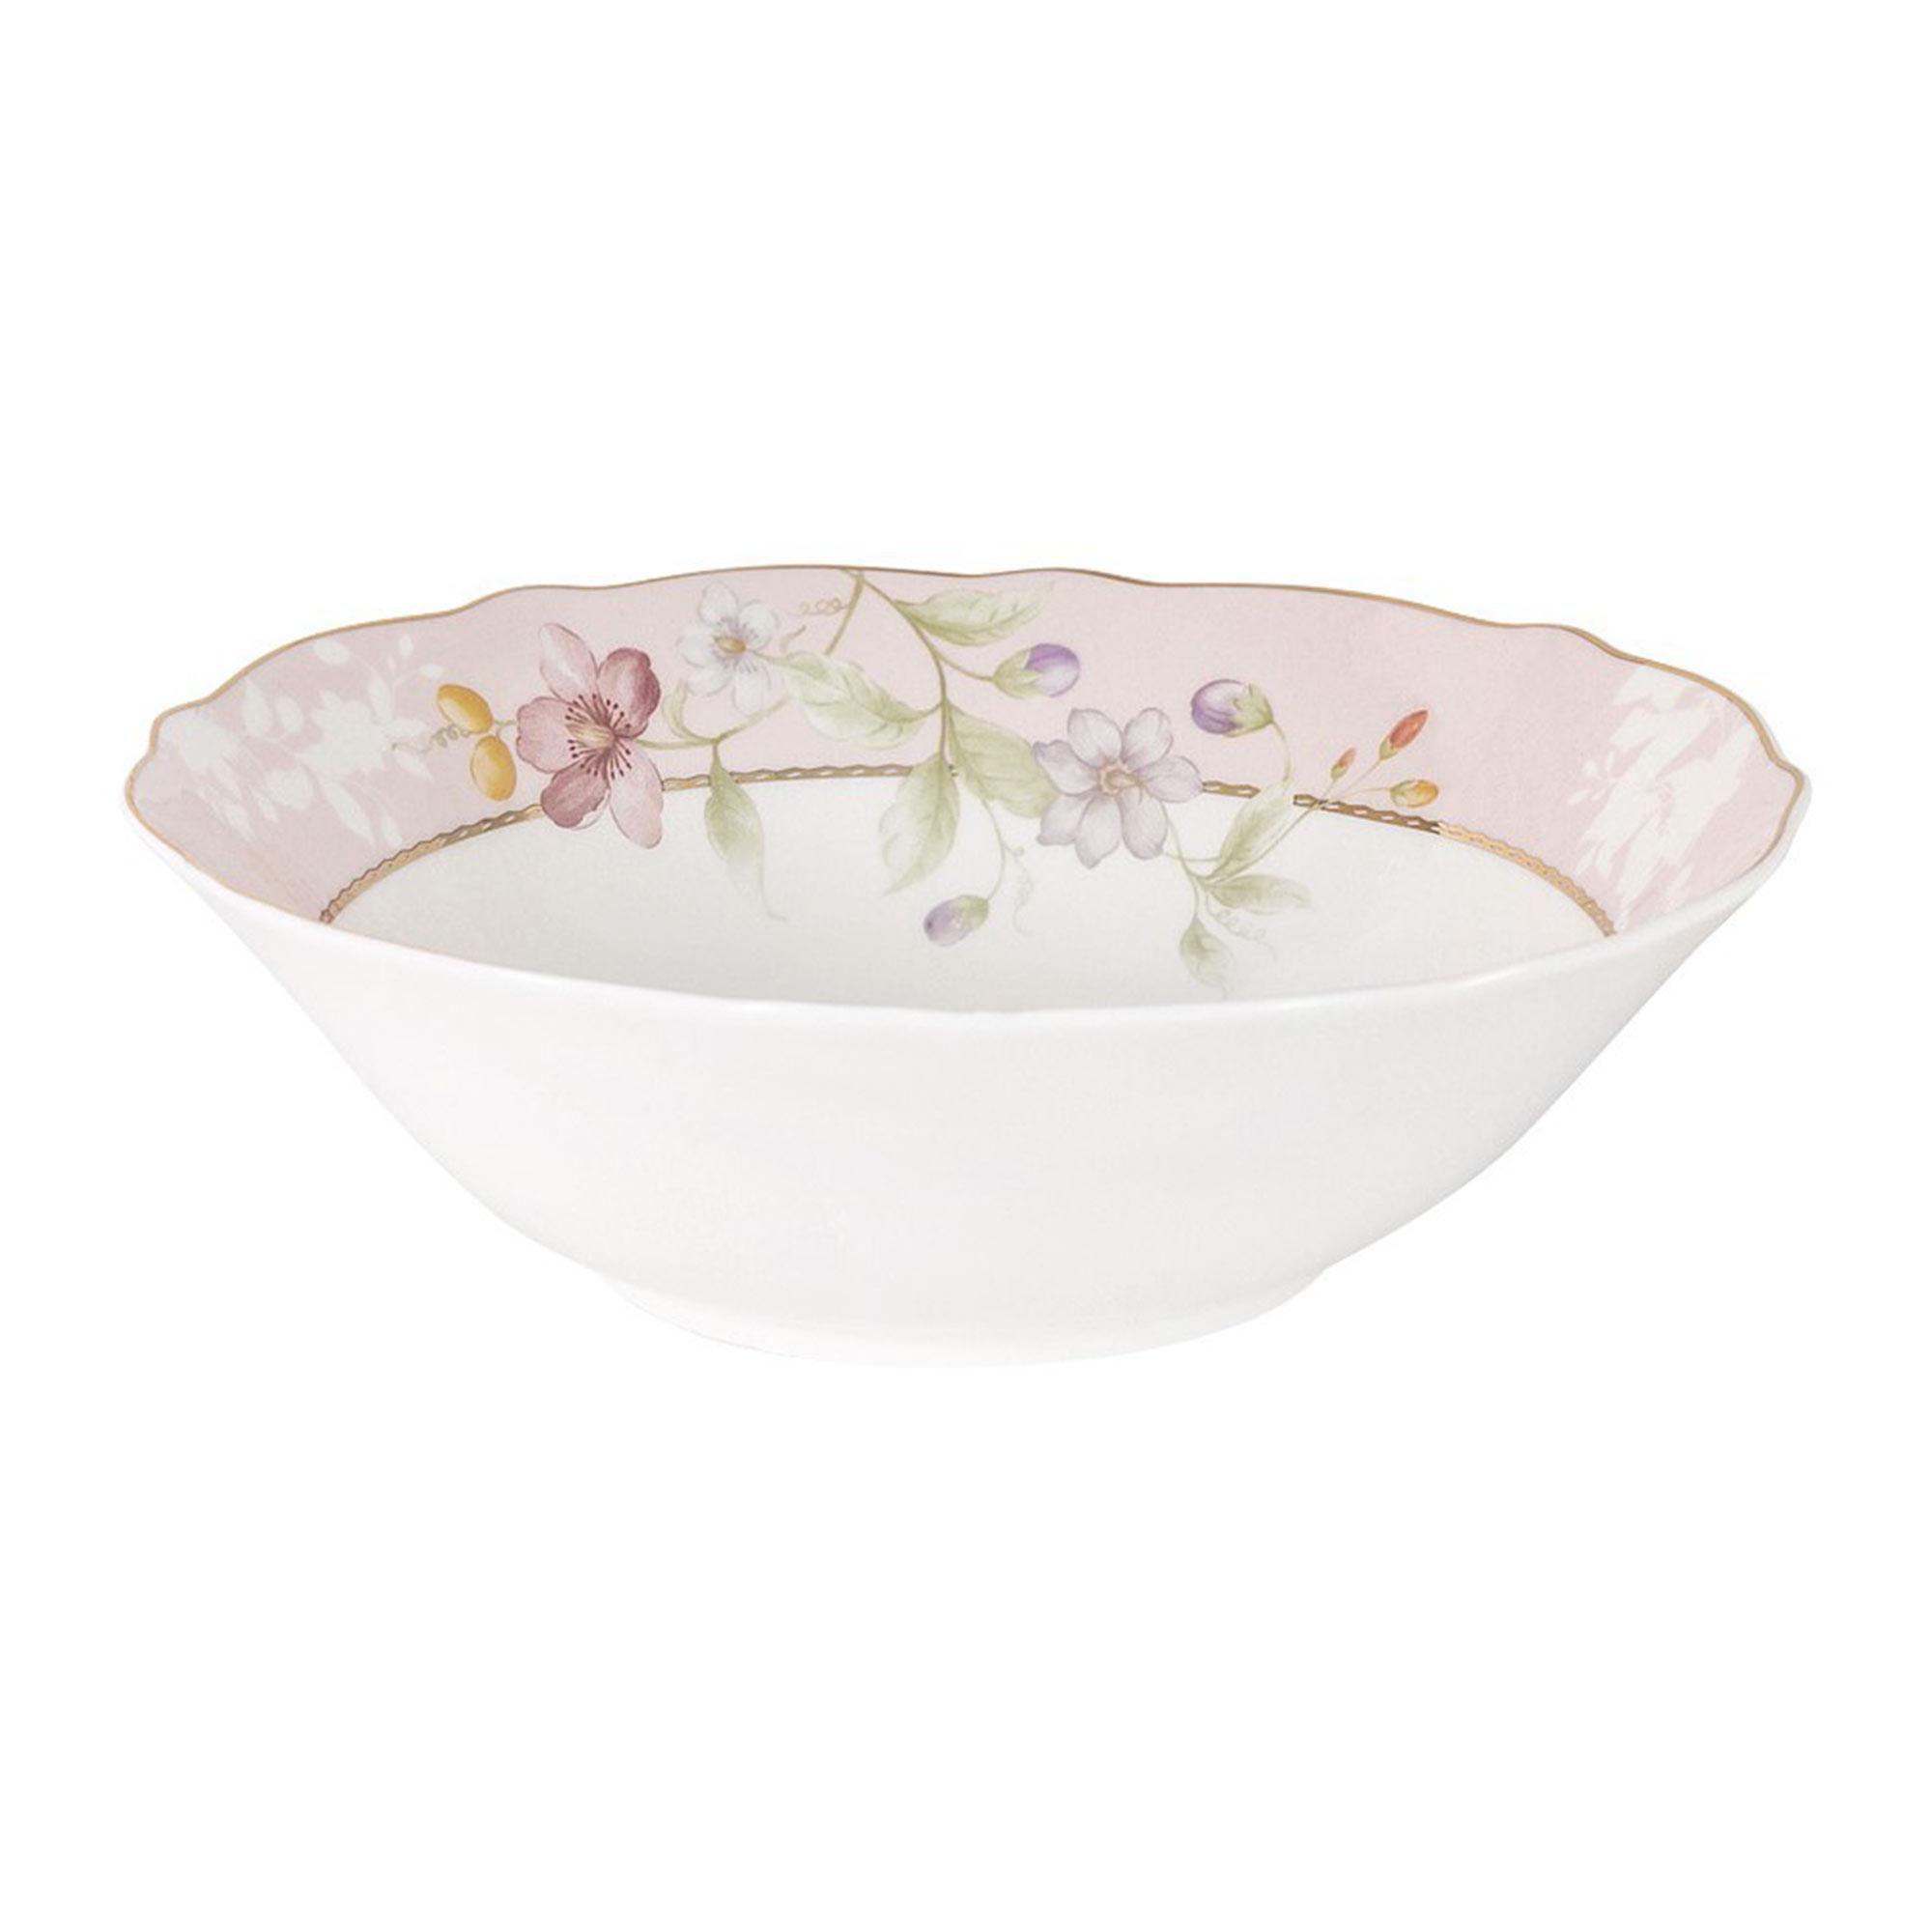 Салатник Anna Lafarg Цветы 1,2 л 23 см тарелка закусочная anna lafarg emily kamelia 19 см